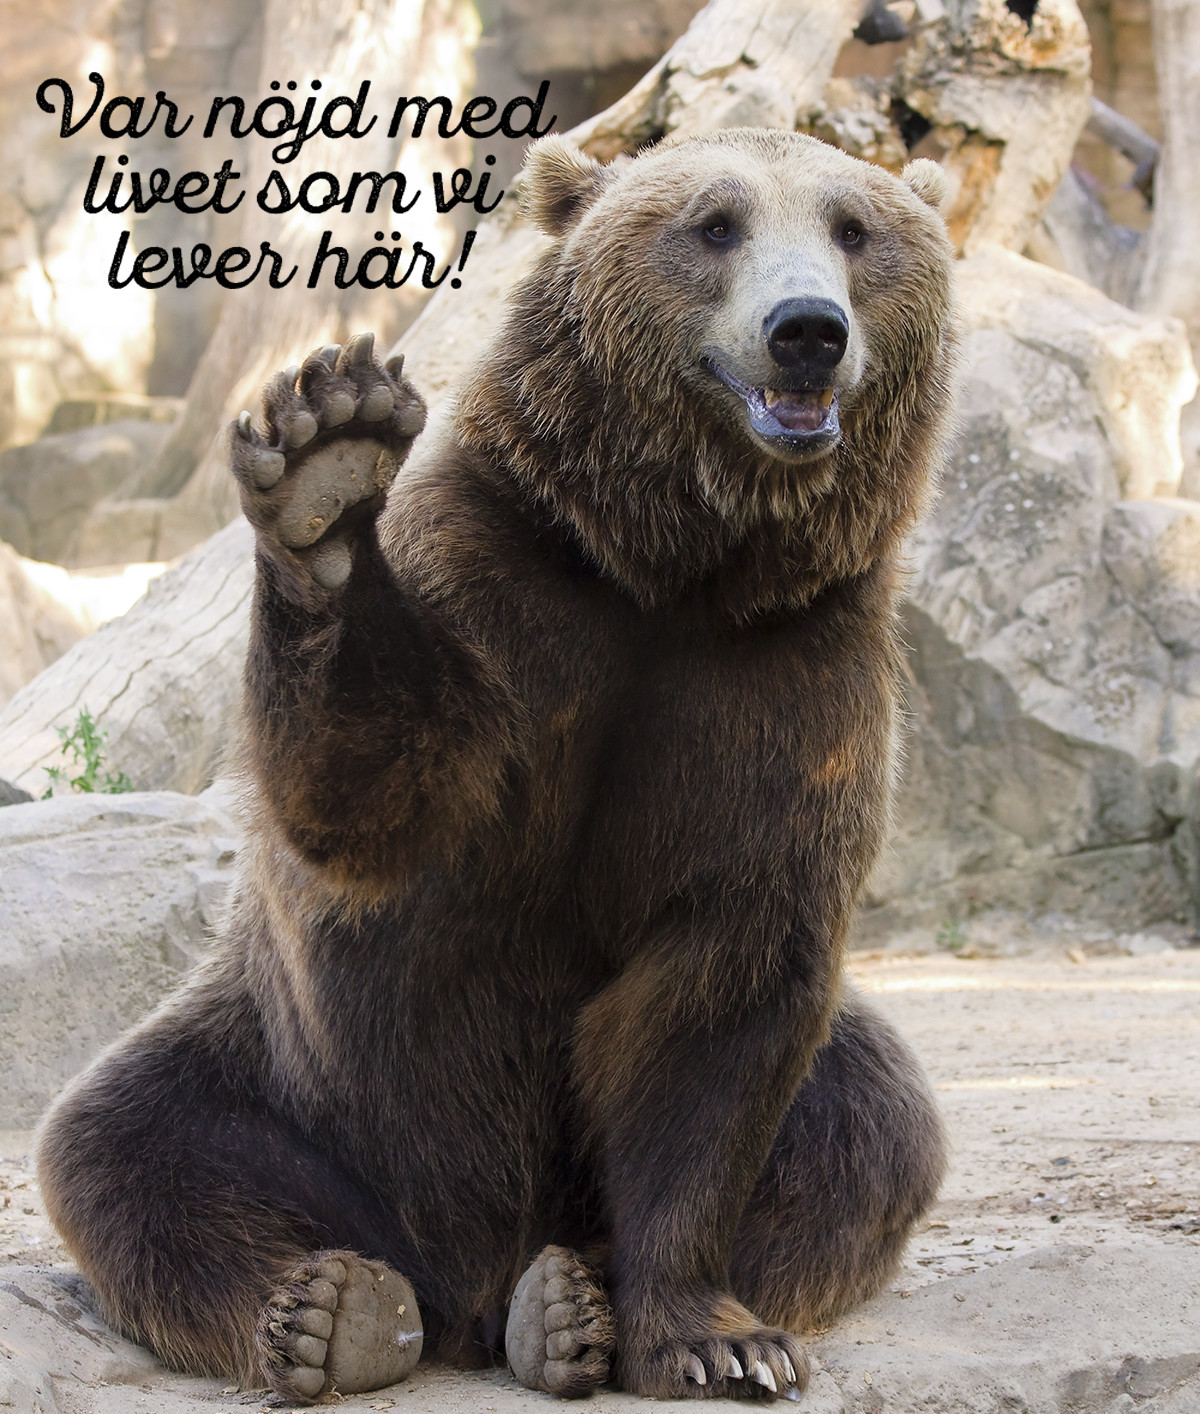 Djungelboken The jungle book Midbec tapet wallpaper inspiration djur bjorn baloo bear